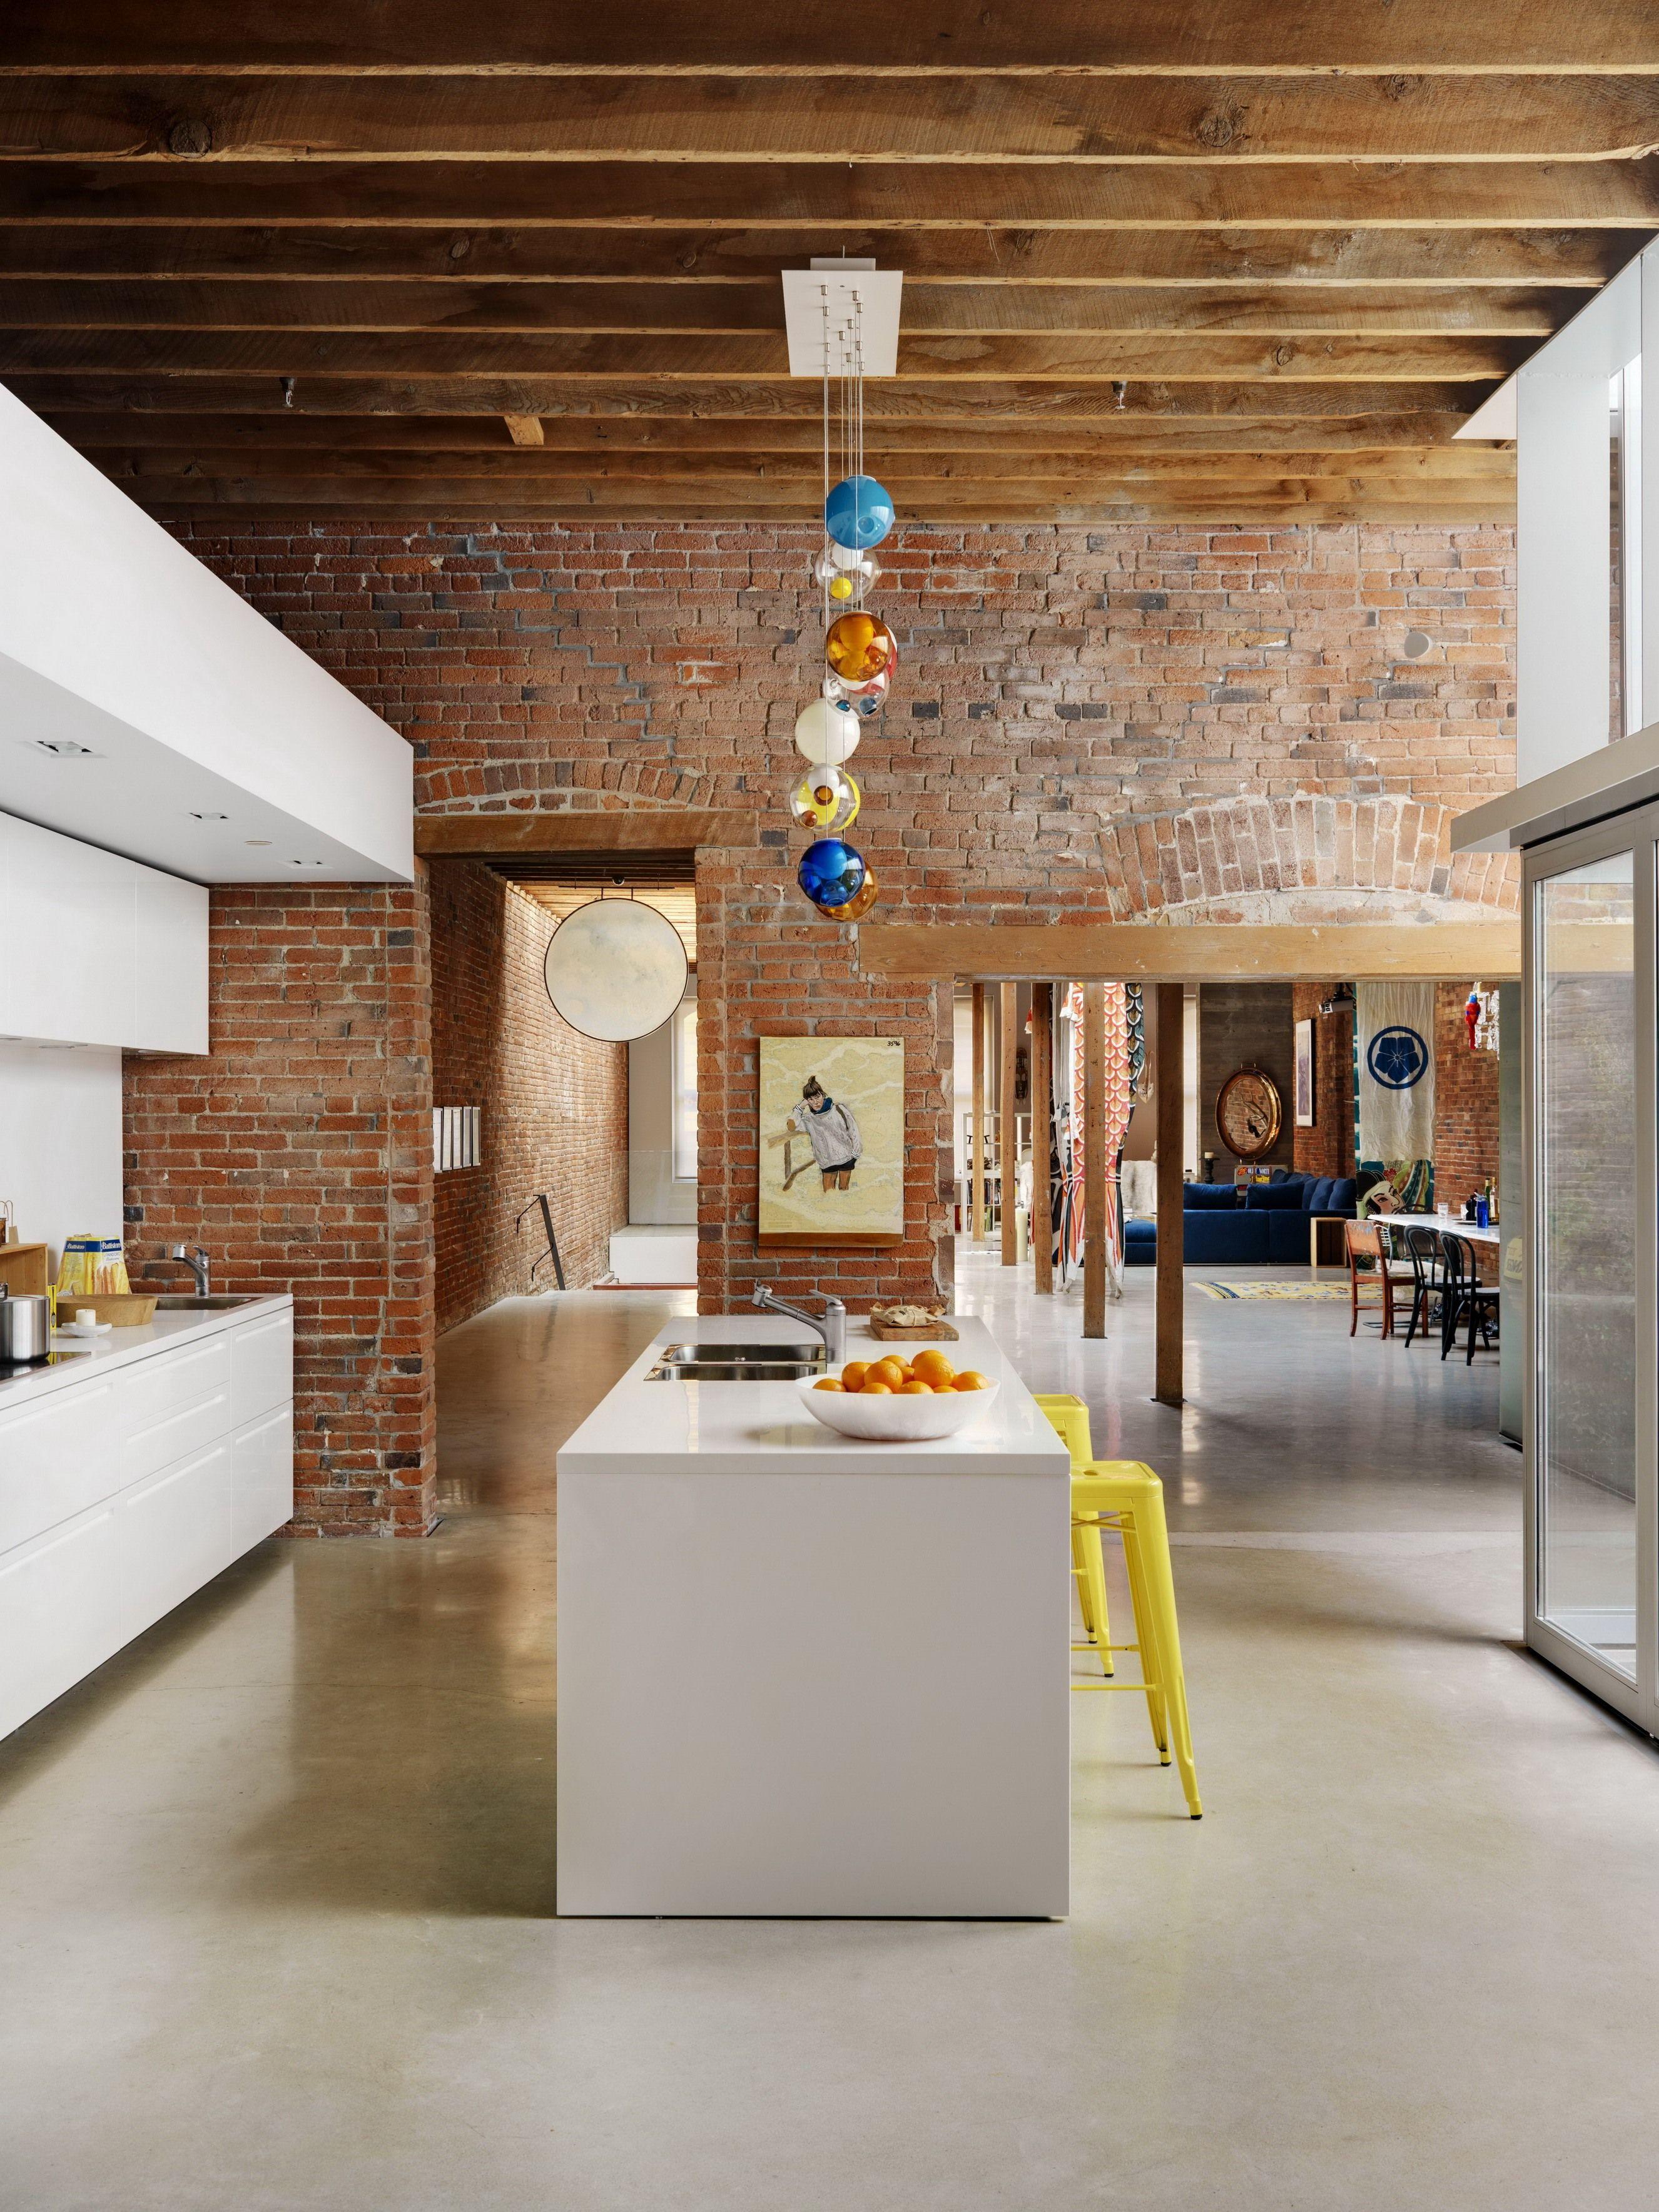 kitchen loft design ideas. loft kitchen design ideas homes abc